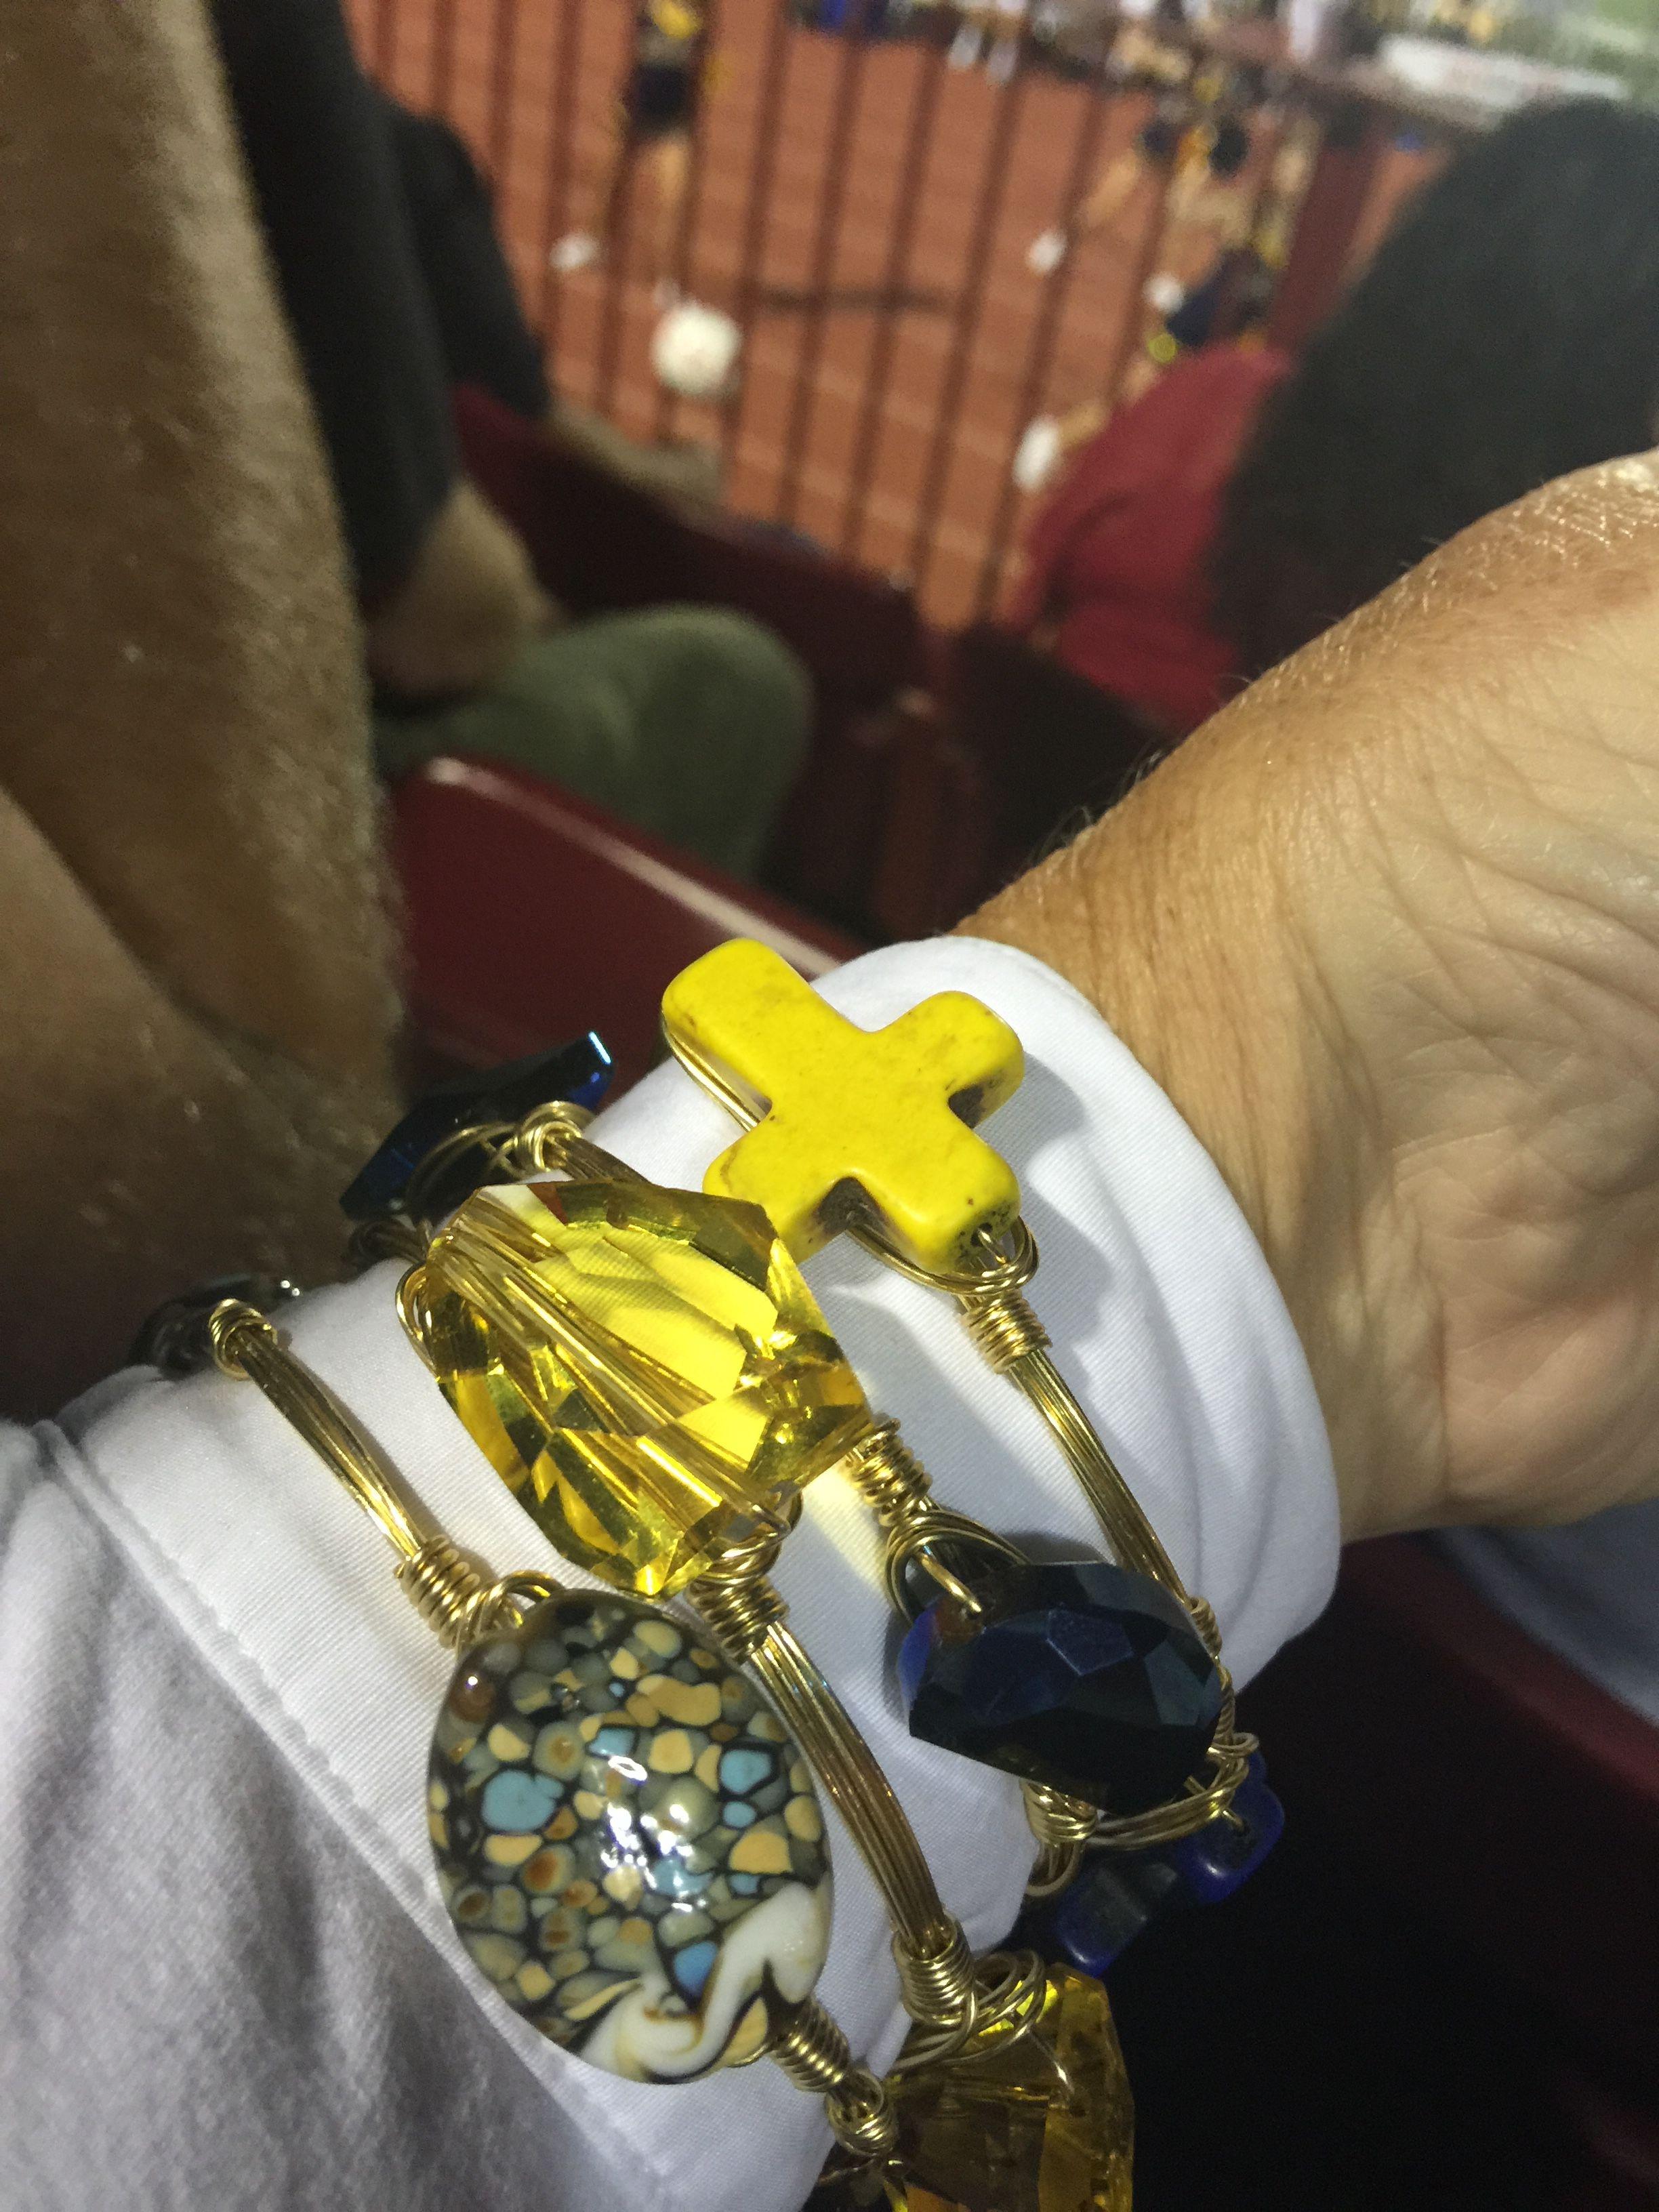 My East Tennessee State University bracelets!  Go BUCS!